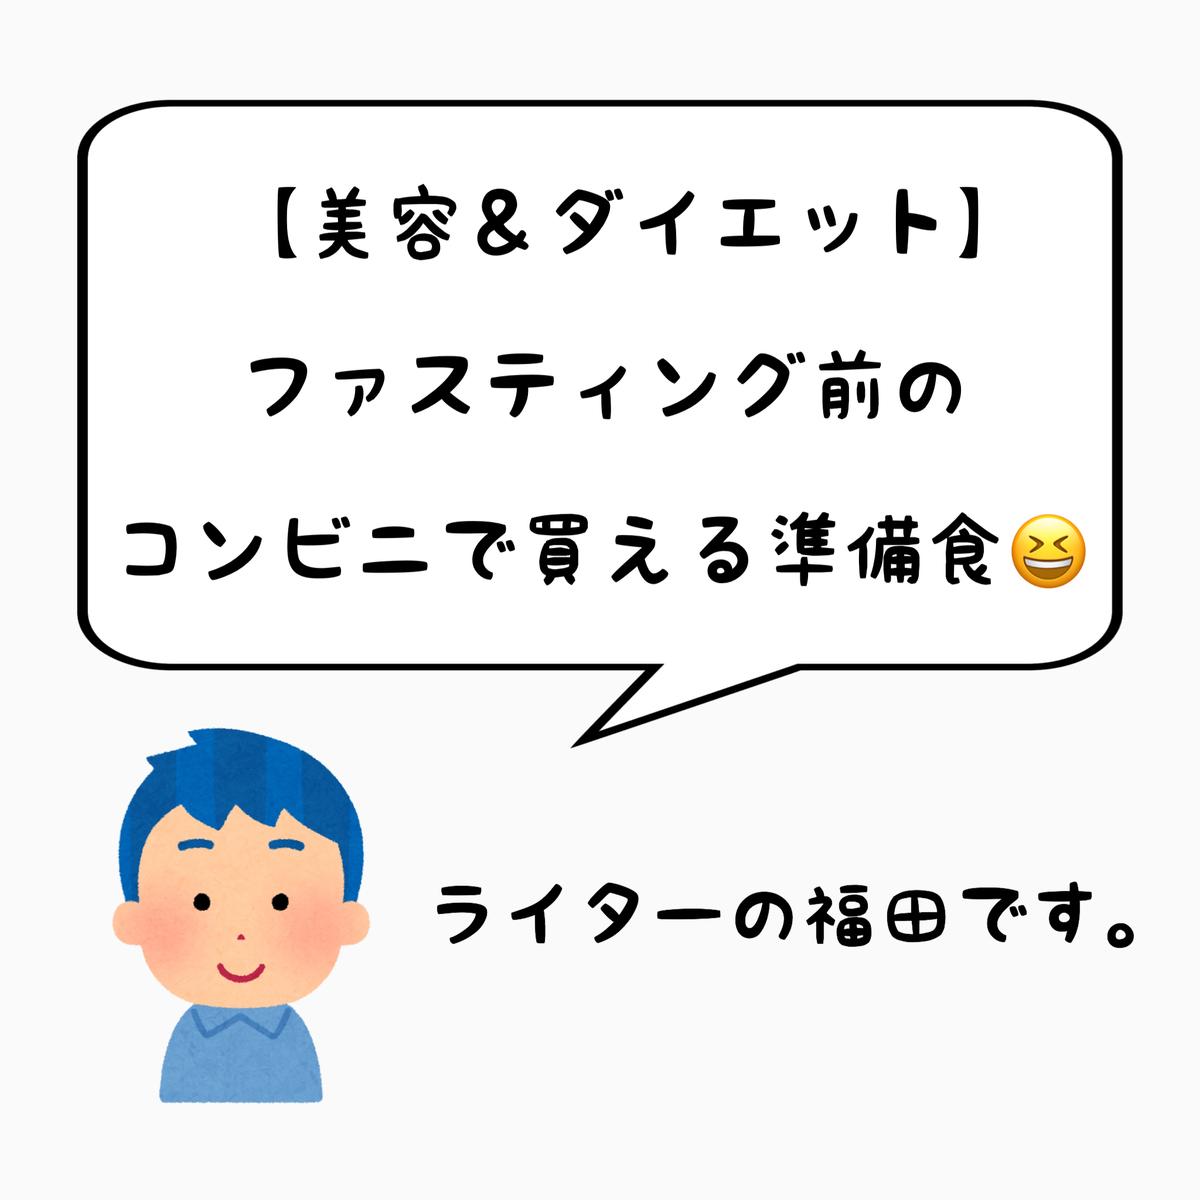 f:id:nokonoko_o:20201109165115j:plain